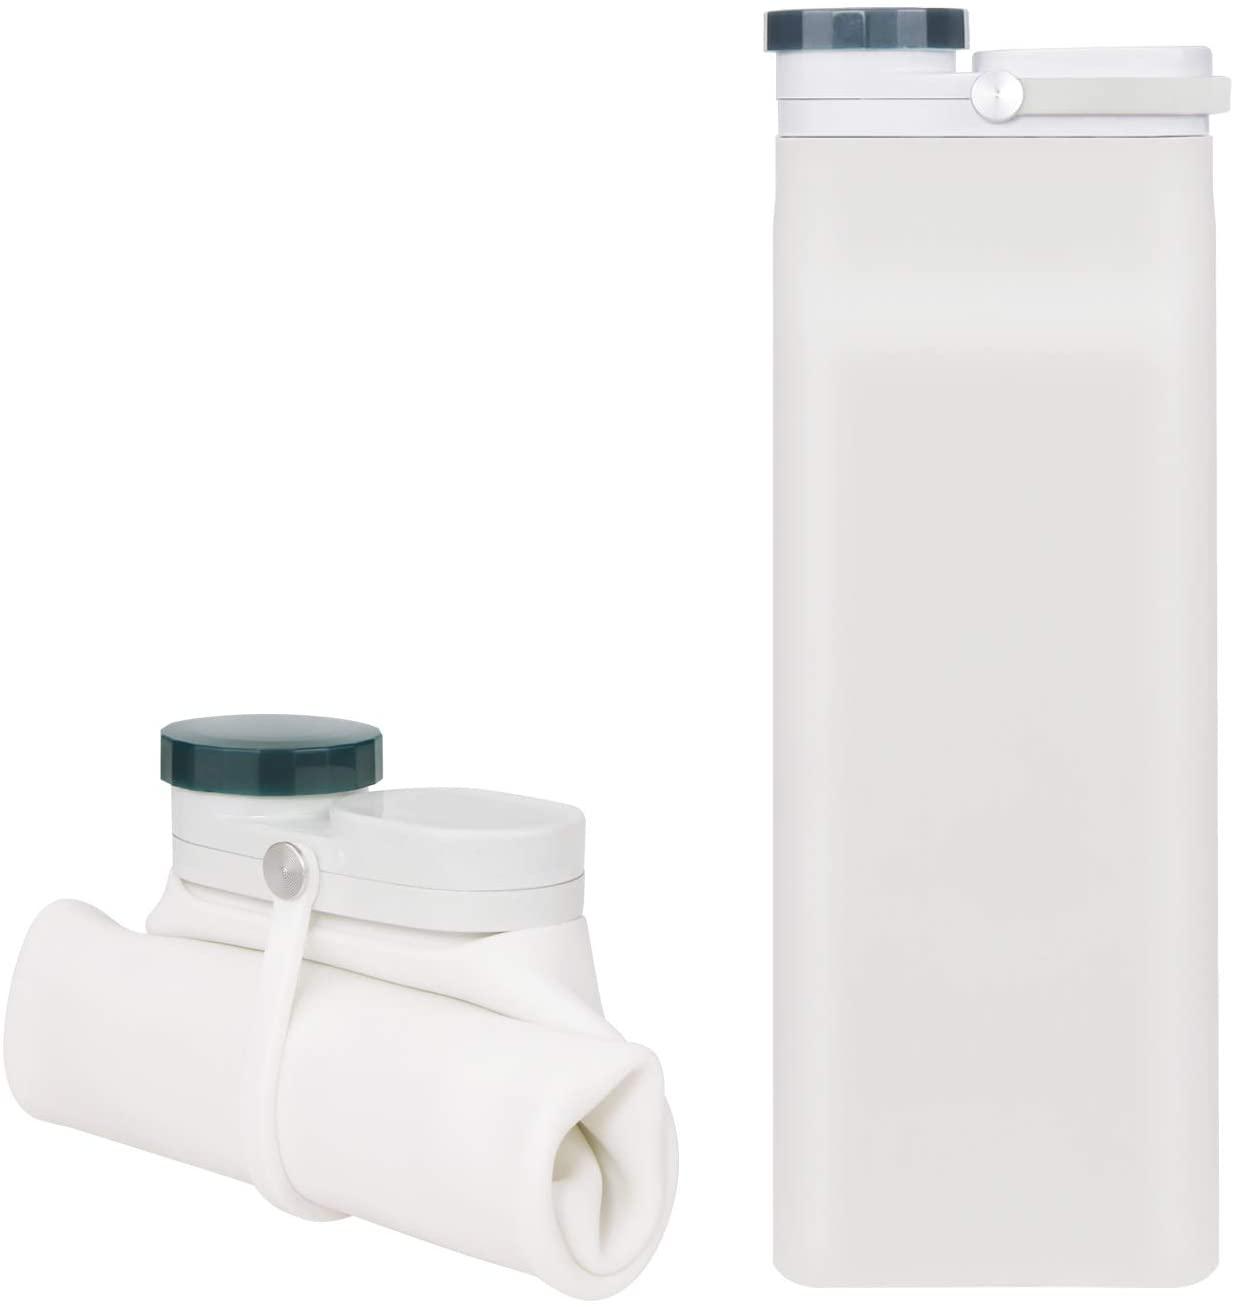 KARIDUN Collapsible Water Bottle for Travel Foldable Water Bottle BPA Free Hiking Water Bottles Sport Water Bottle